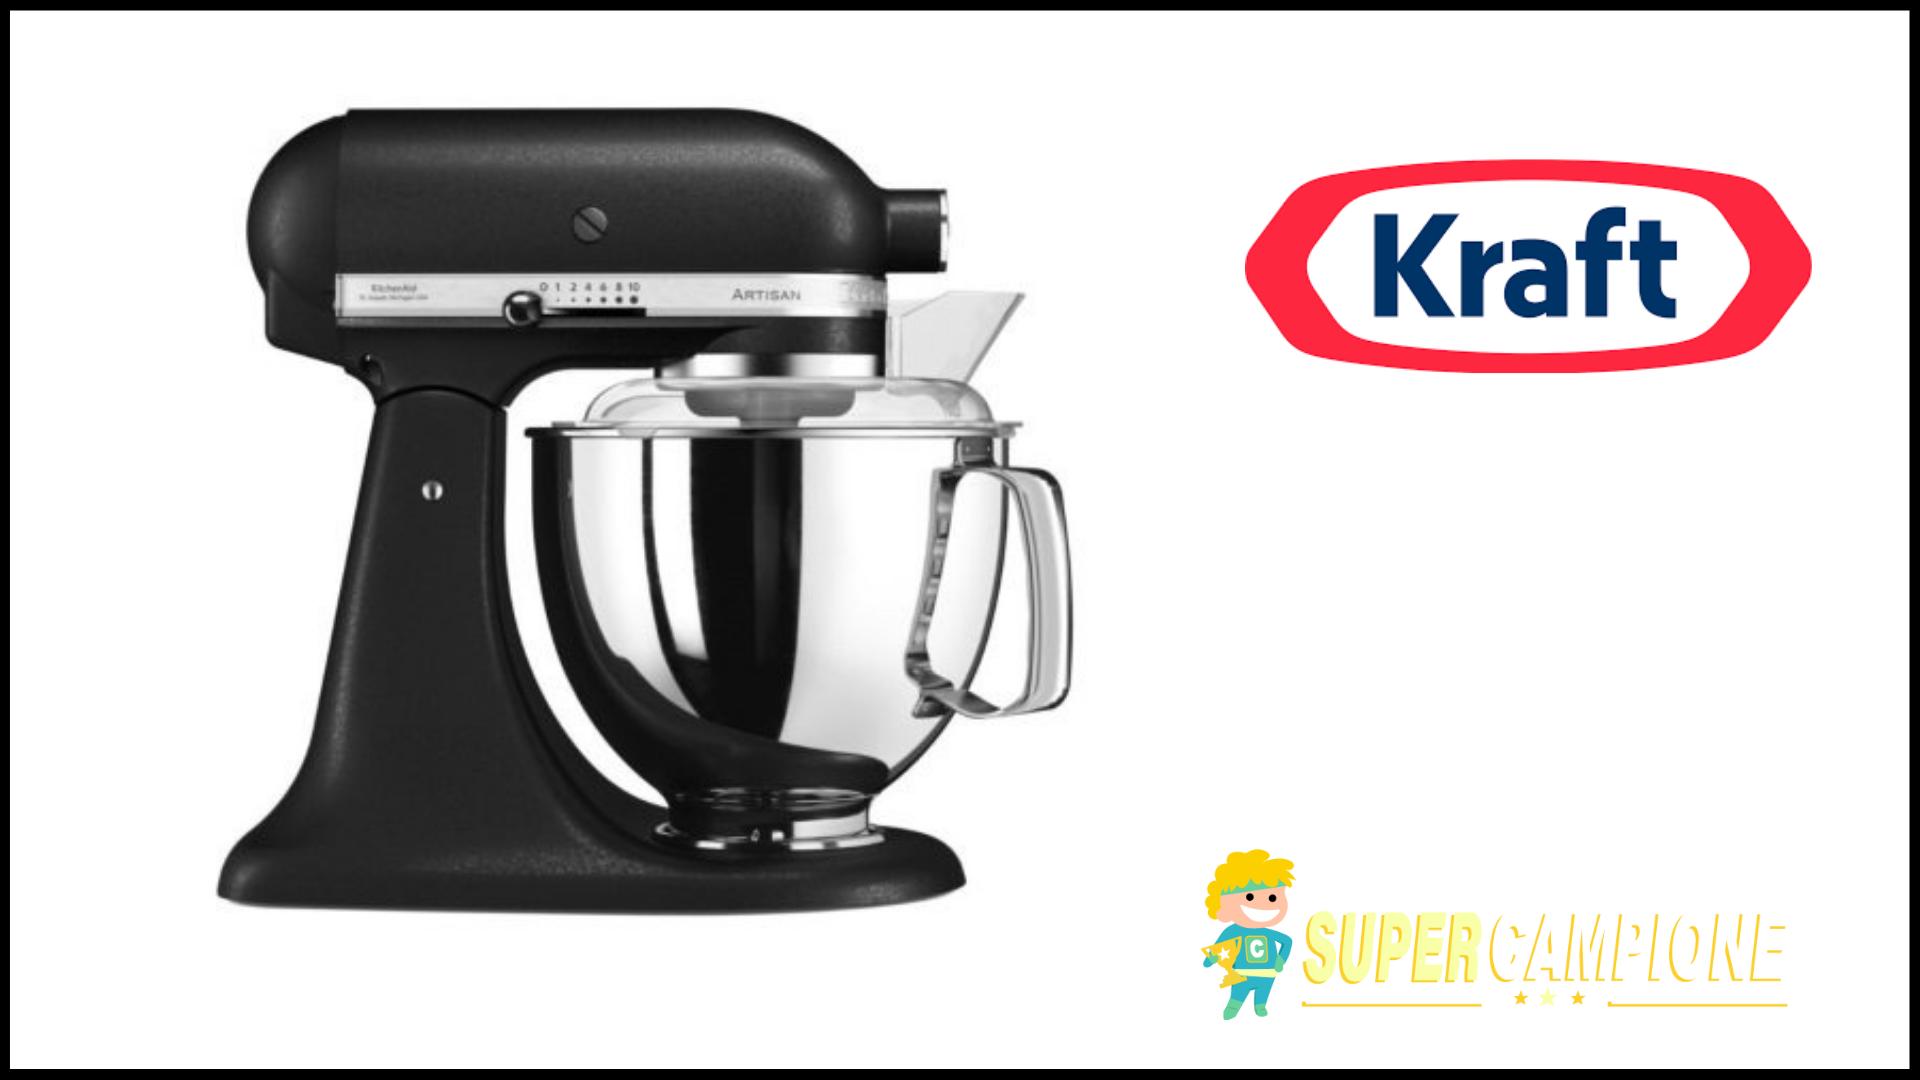 Vinci robot da cucina Artisan KitchenAid con Kraft - SuperCampione